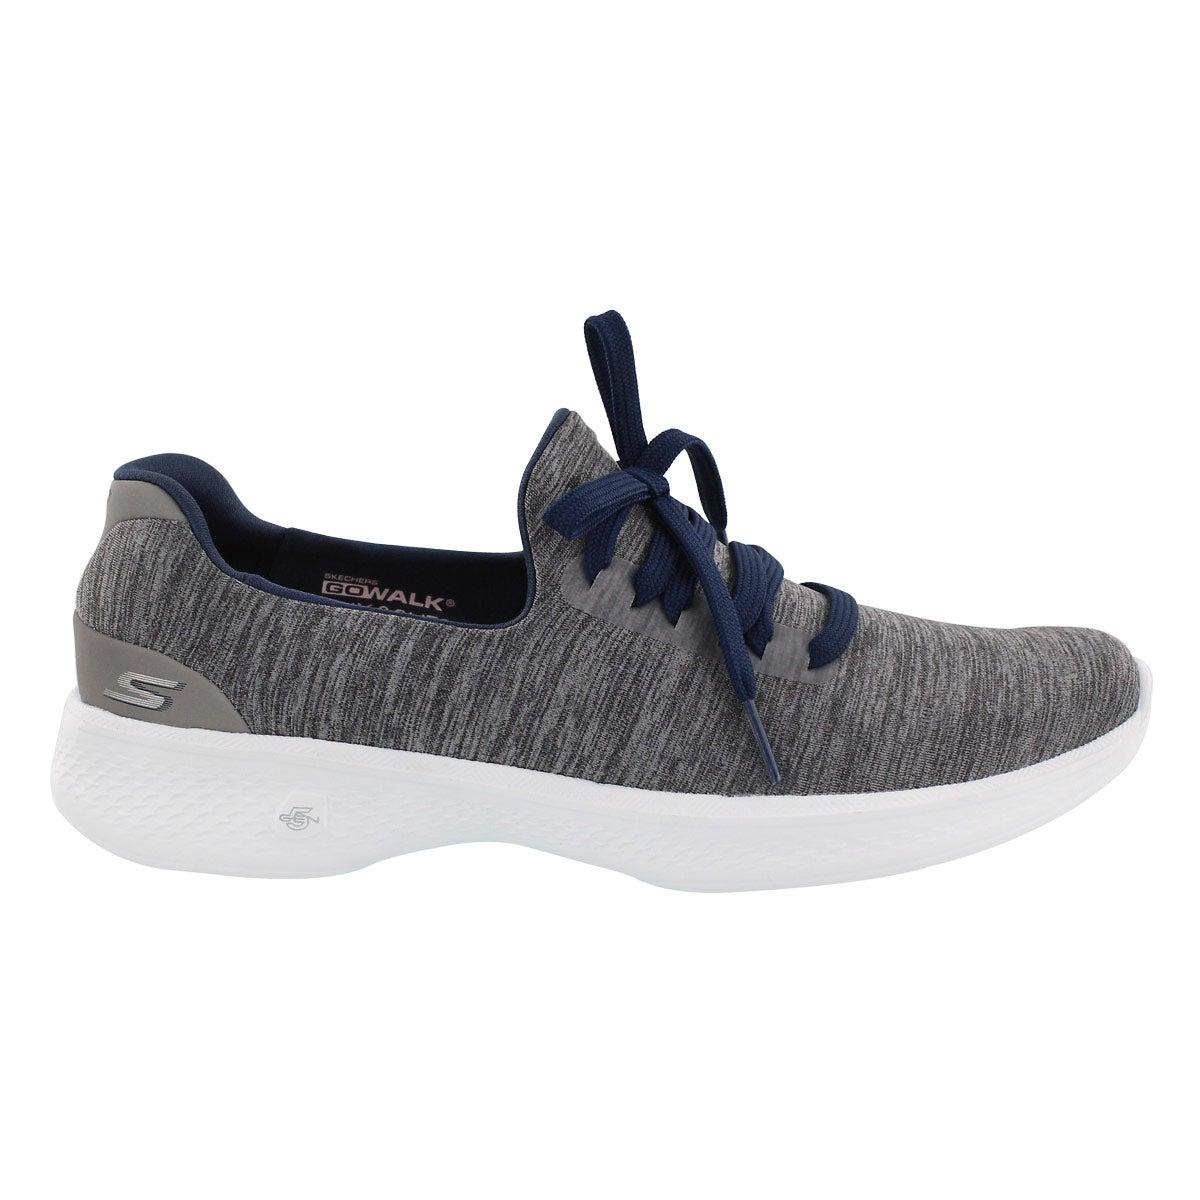 Lds GOwalk 4 gry/nvy laceup walking shoe